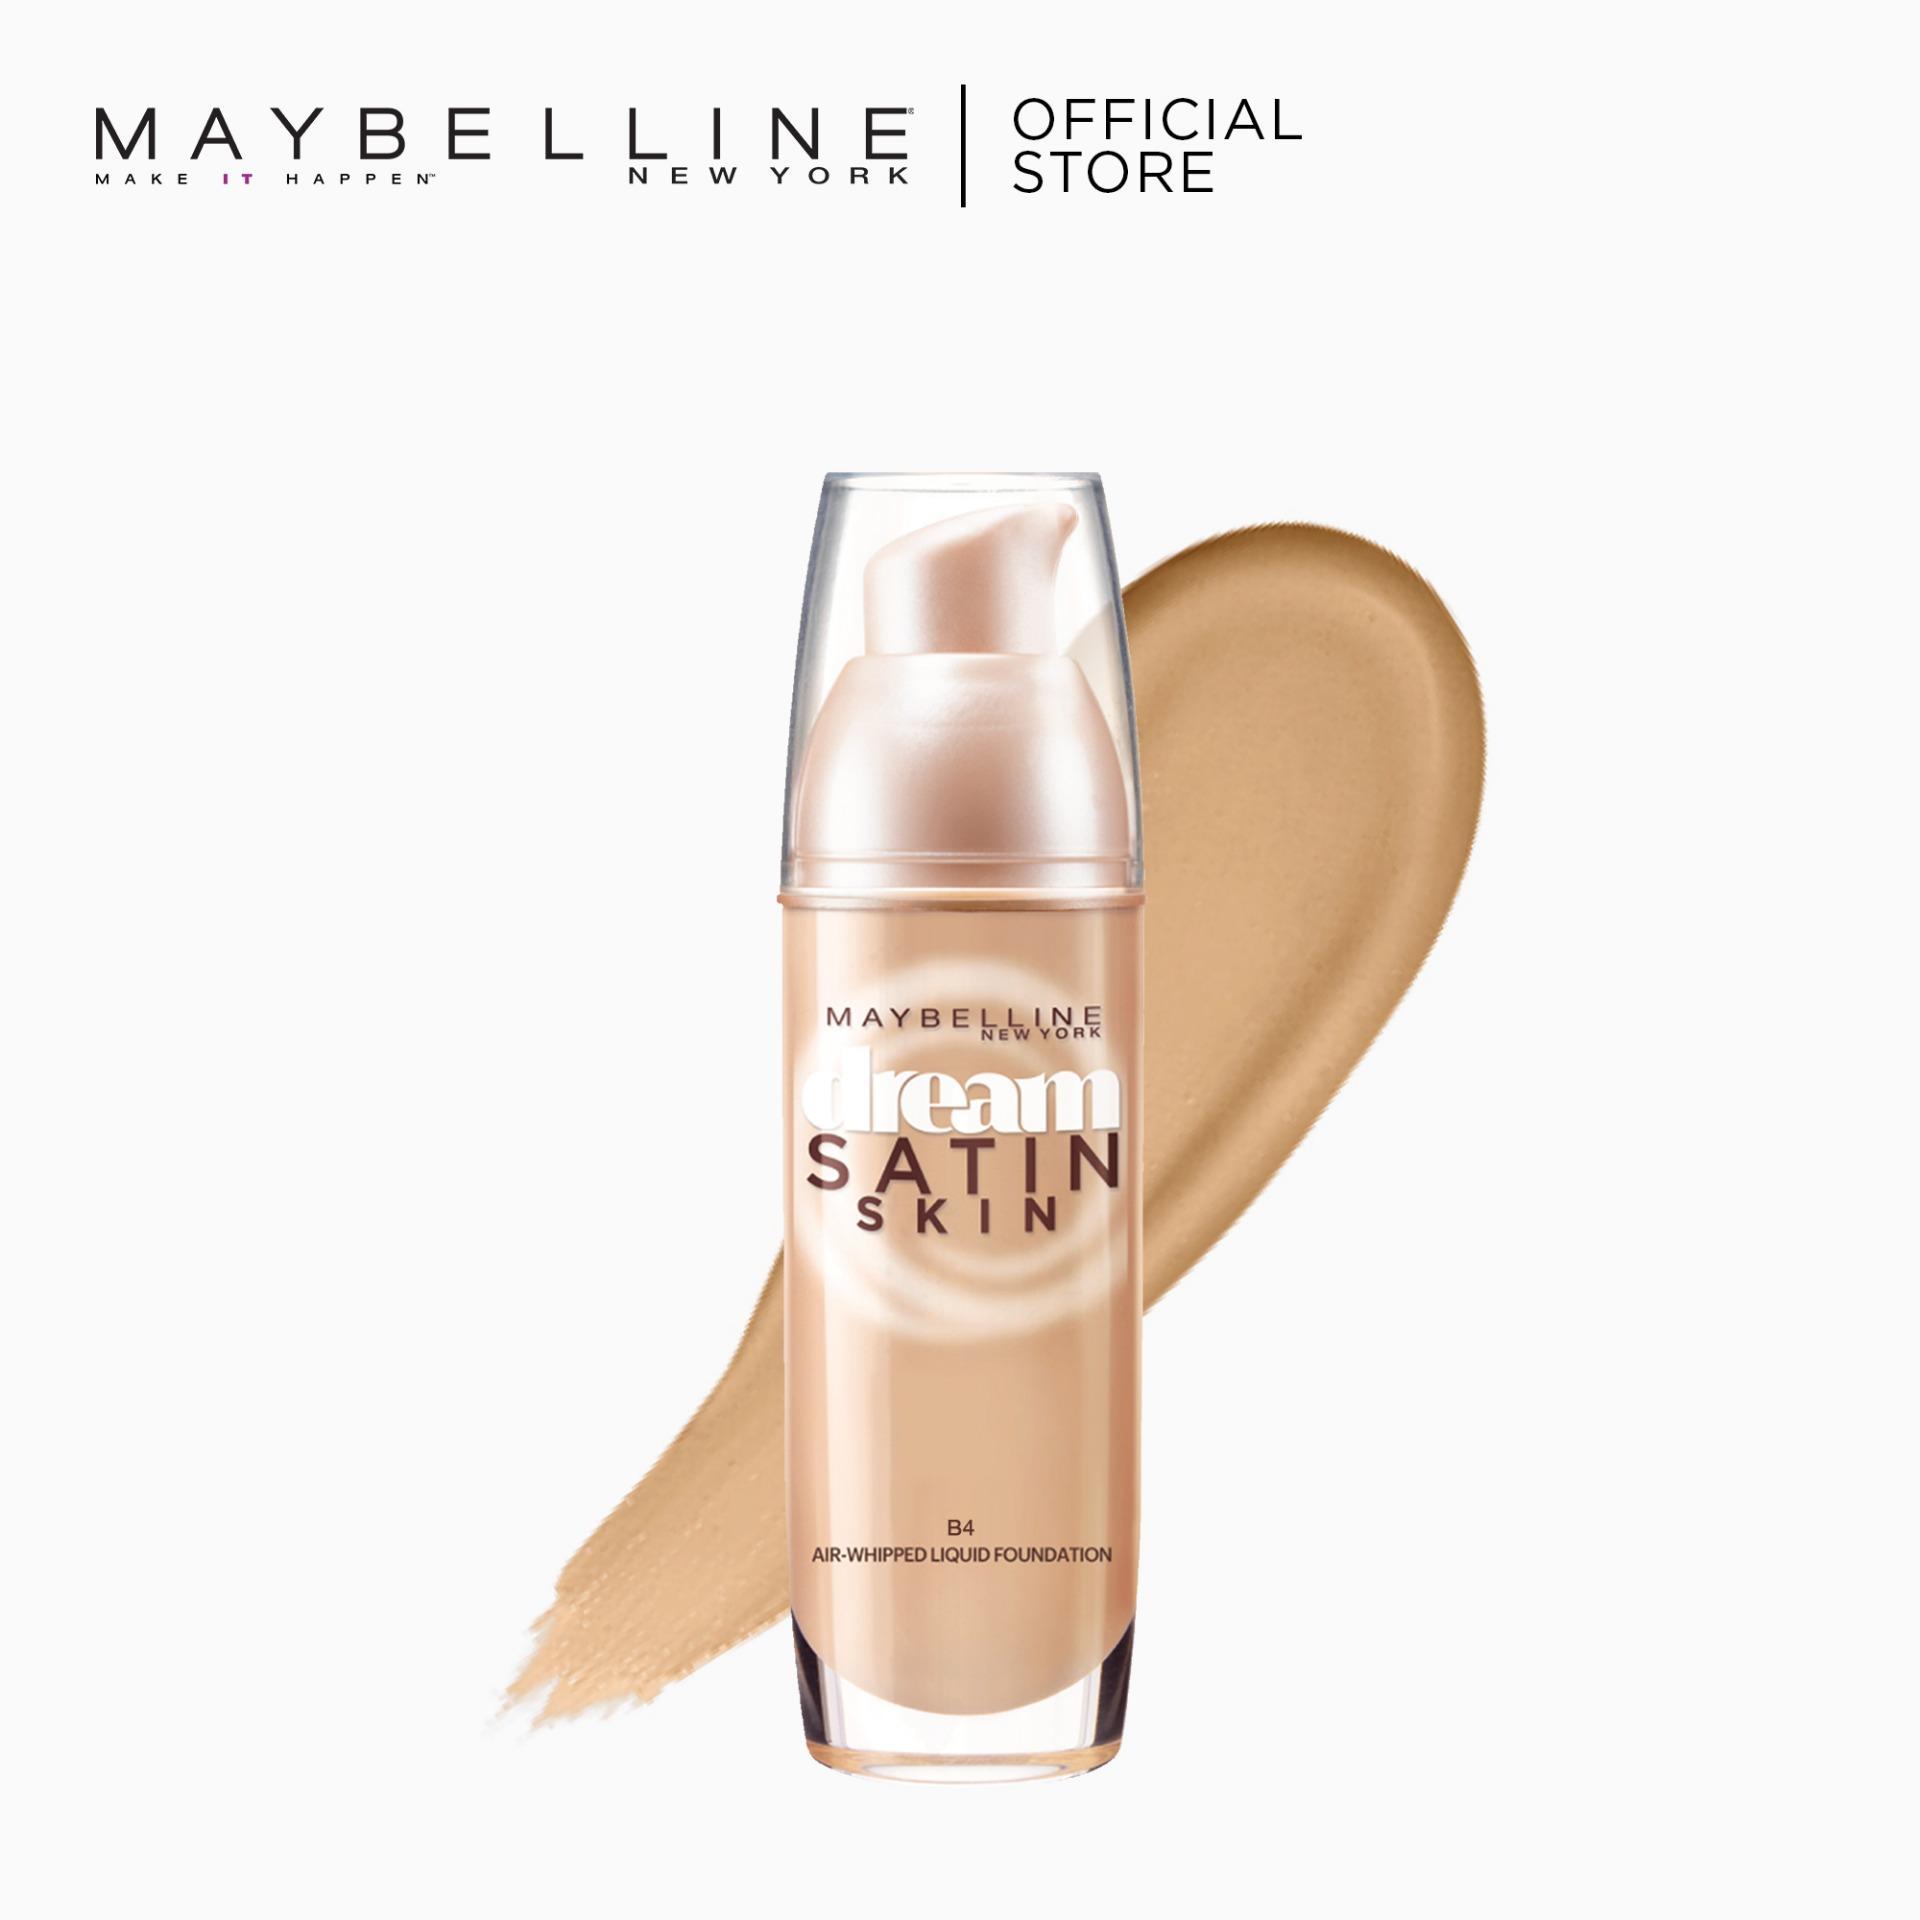 Maybelline Dream Satin Skin Liquid Foundation 30 mL - B4 Back to Basics Foundation Philippines